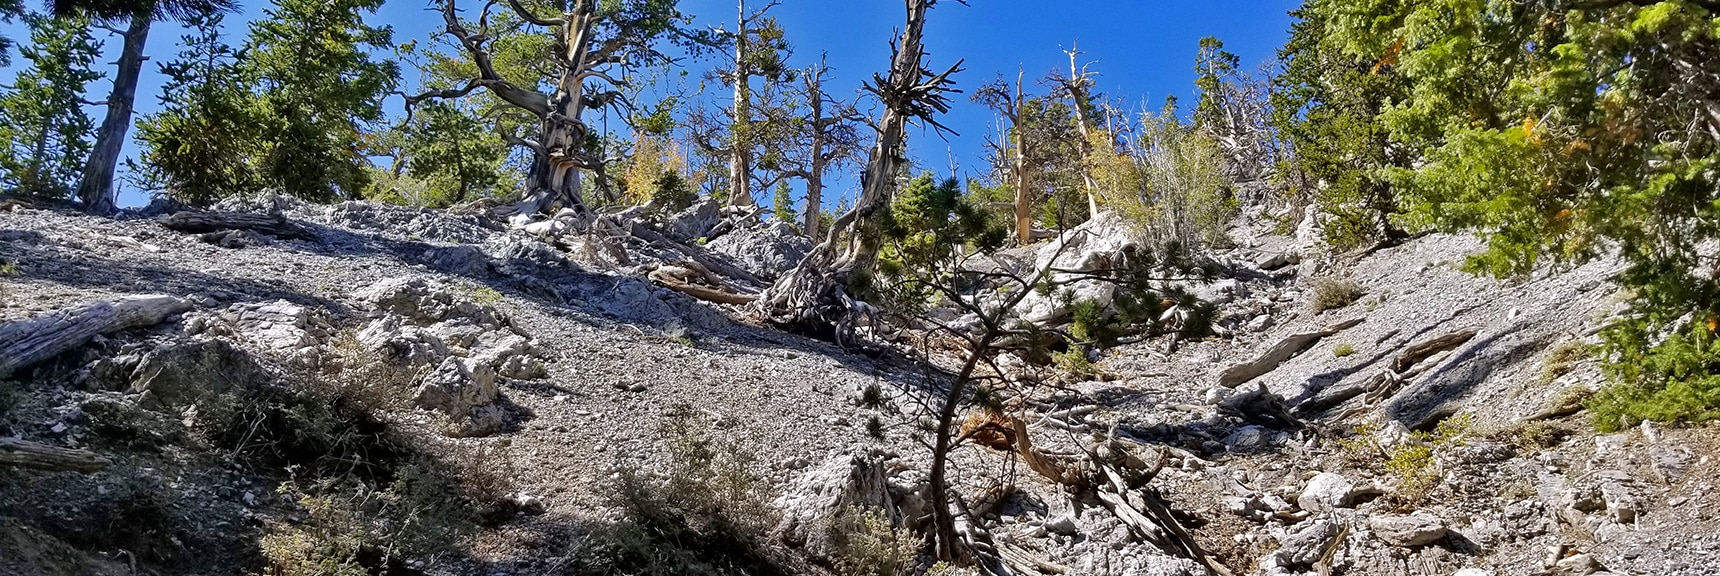 Steep Incline of Cougar Ridge Trail | Mummy Springs Loop | Mt. Charleston Wilderness | Spring Mountains, Nevada